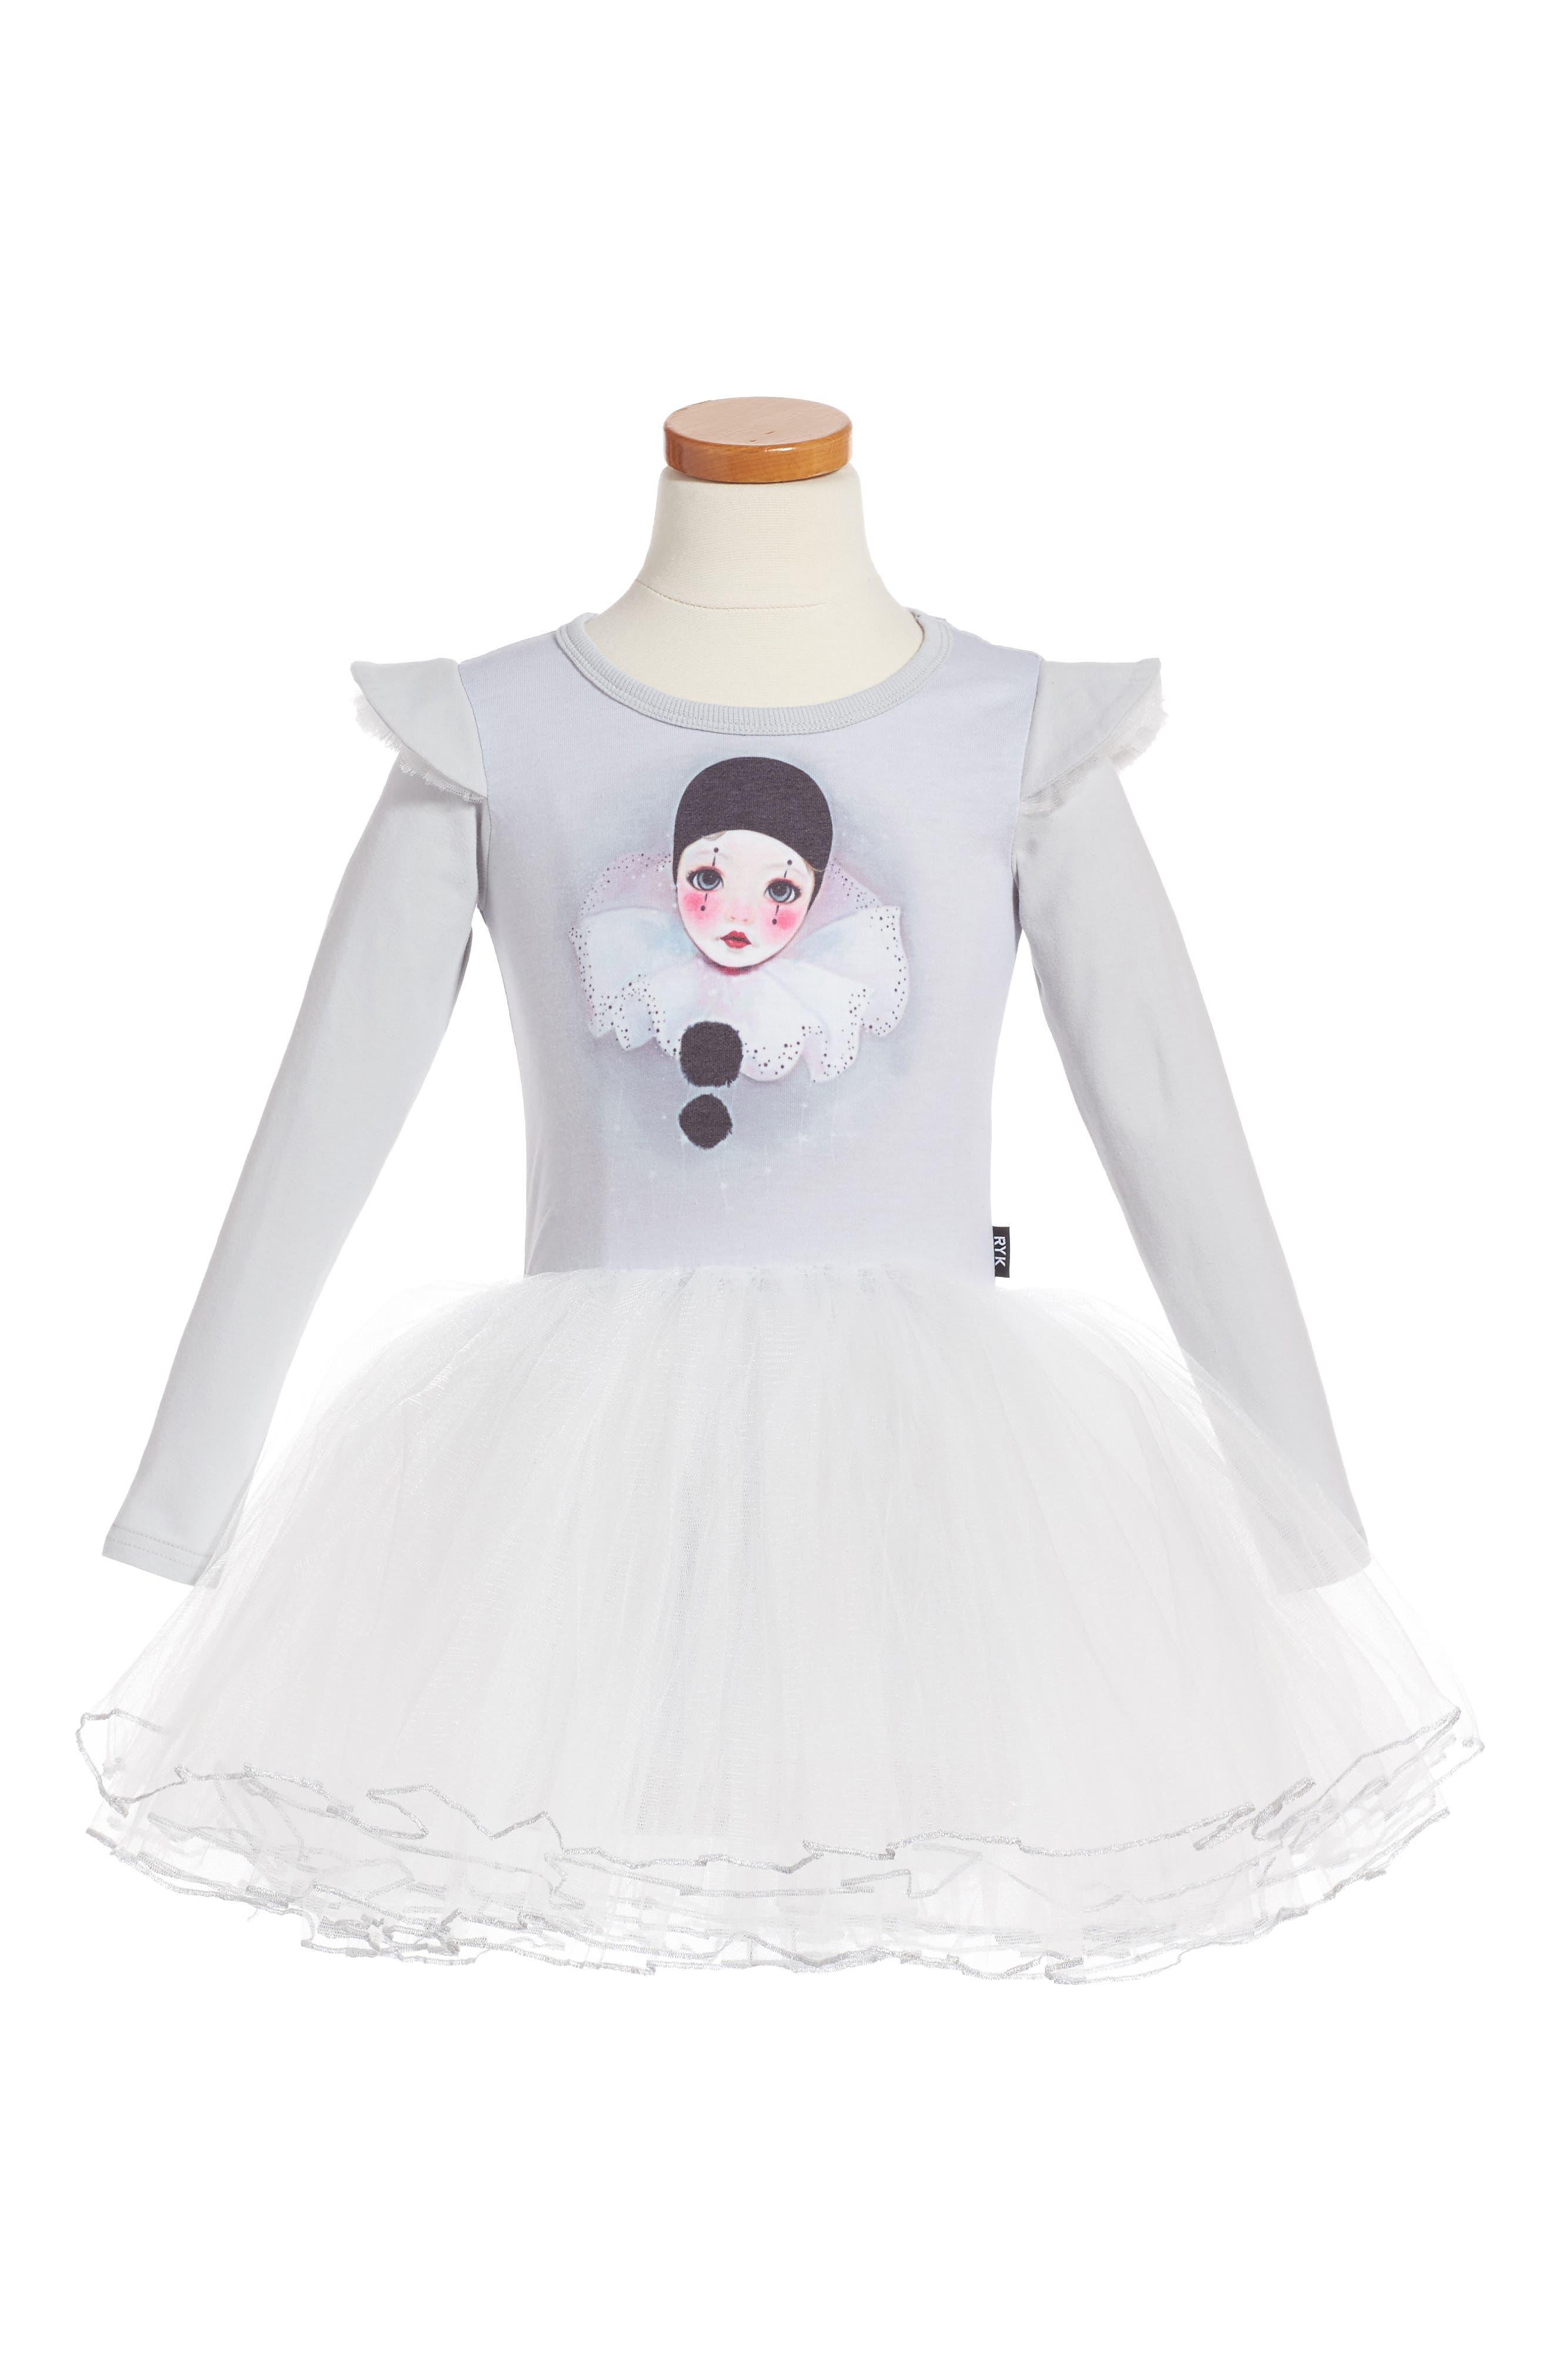 Pierrot Circus Dress,                         Main,                         color, 040